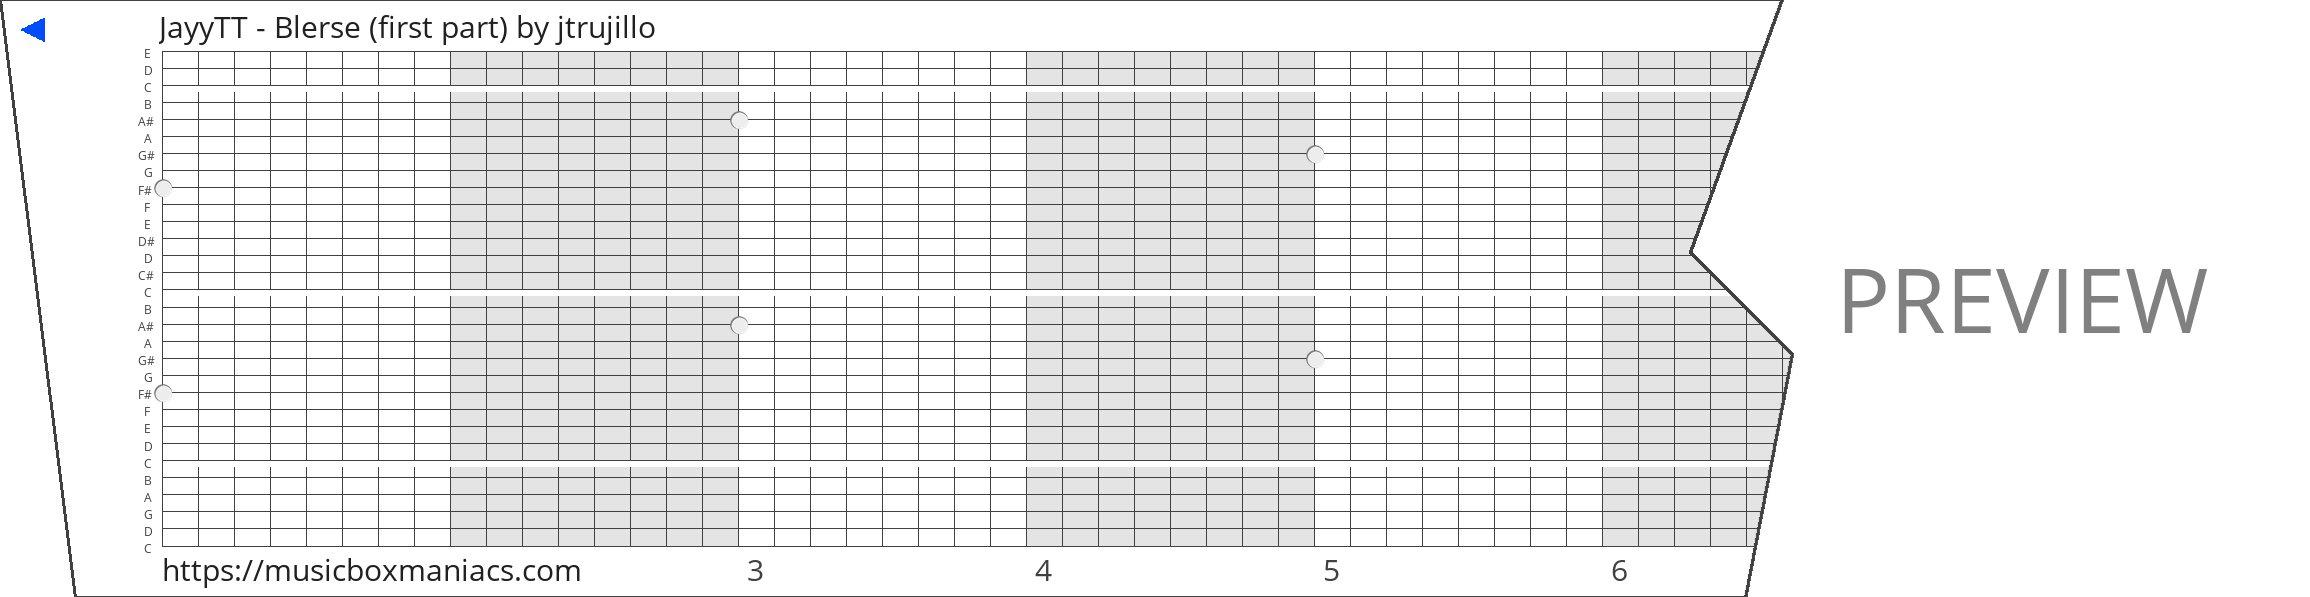 JayyTT - Blerse (first part) 30 note music box paper strip